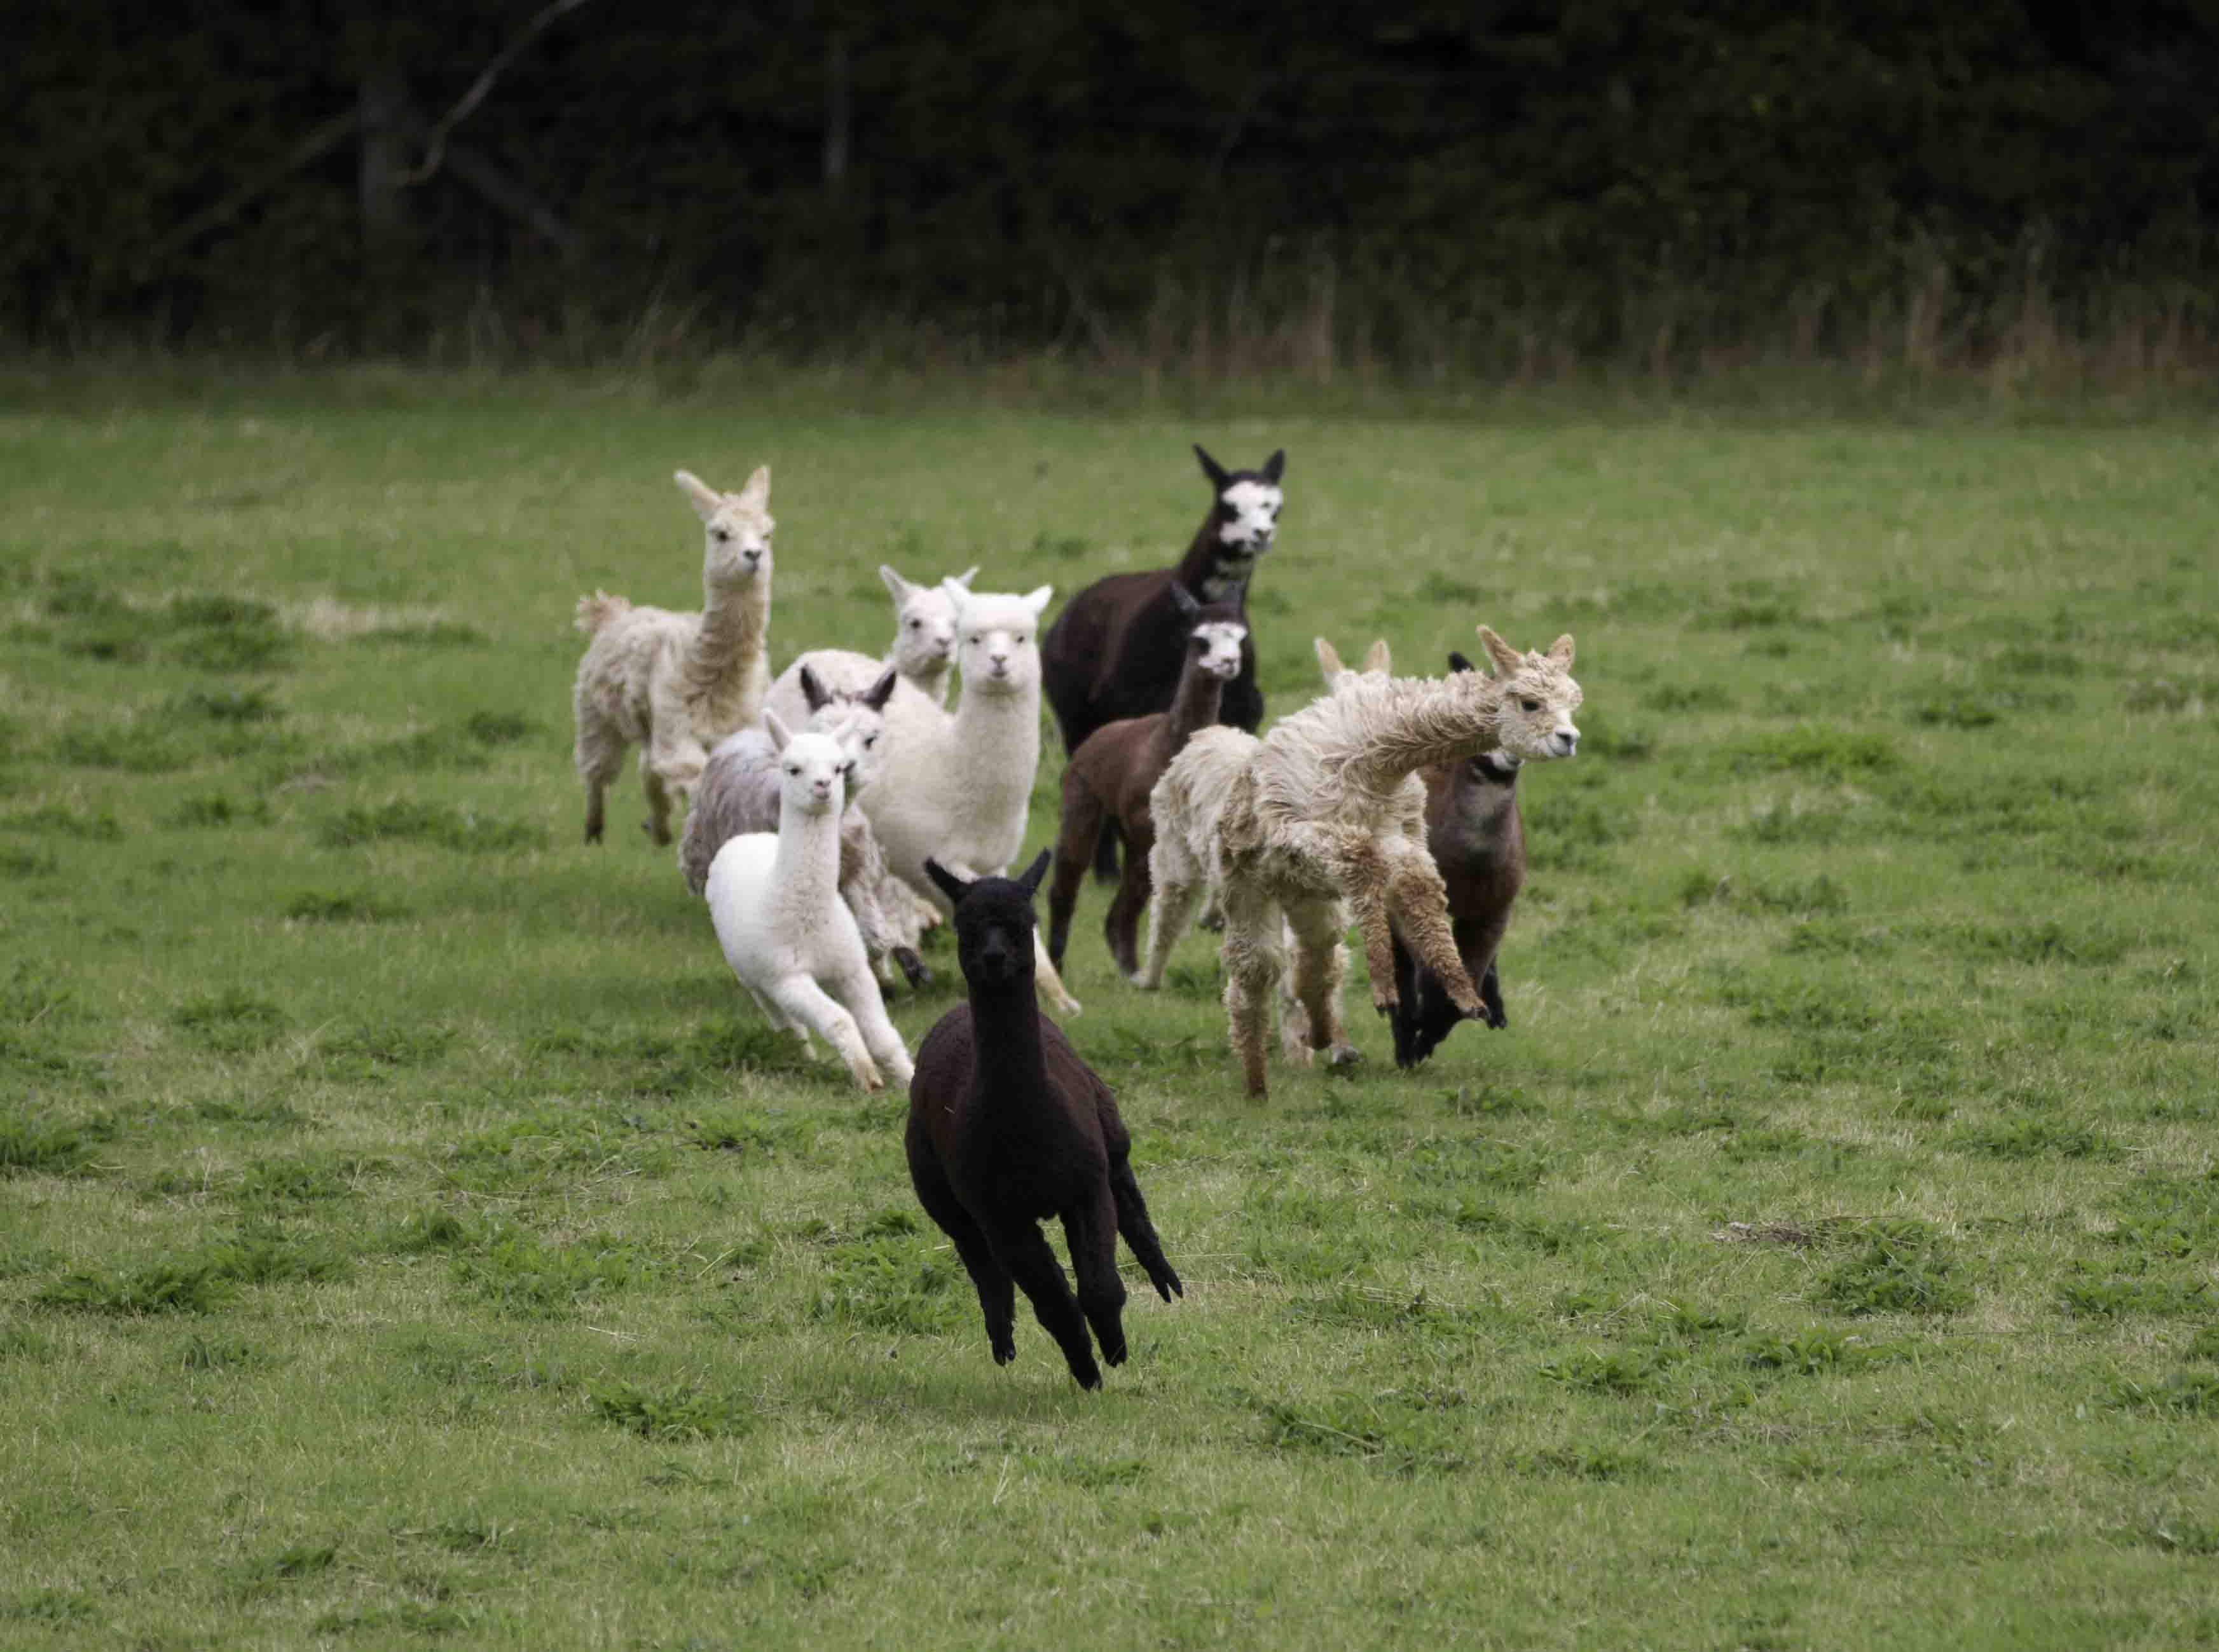 Alpaca in field photo